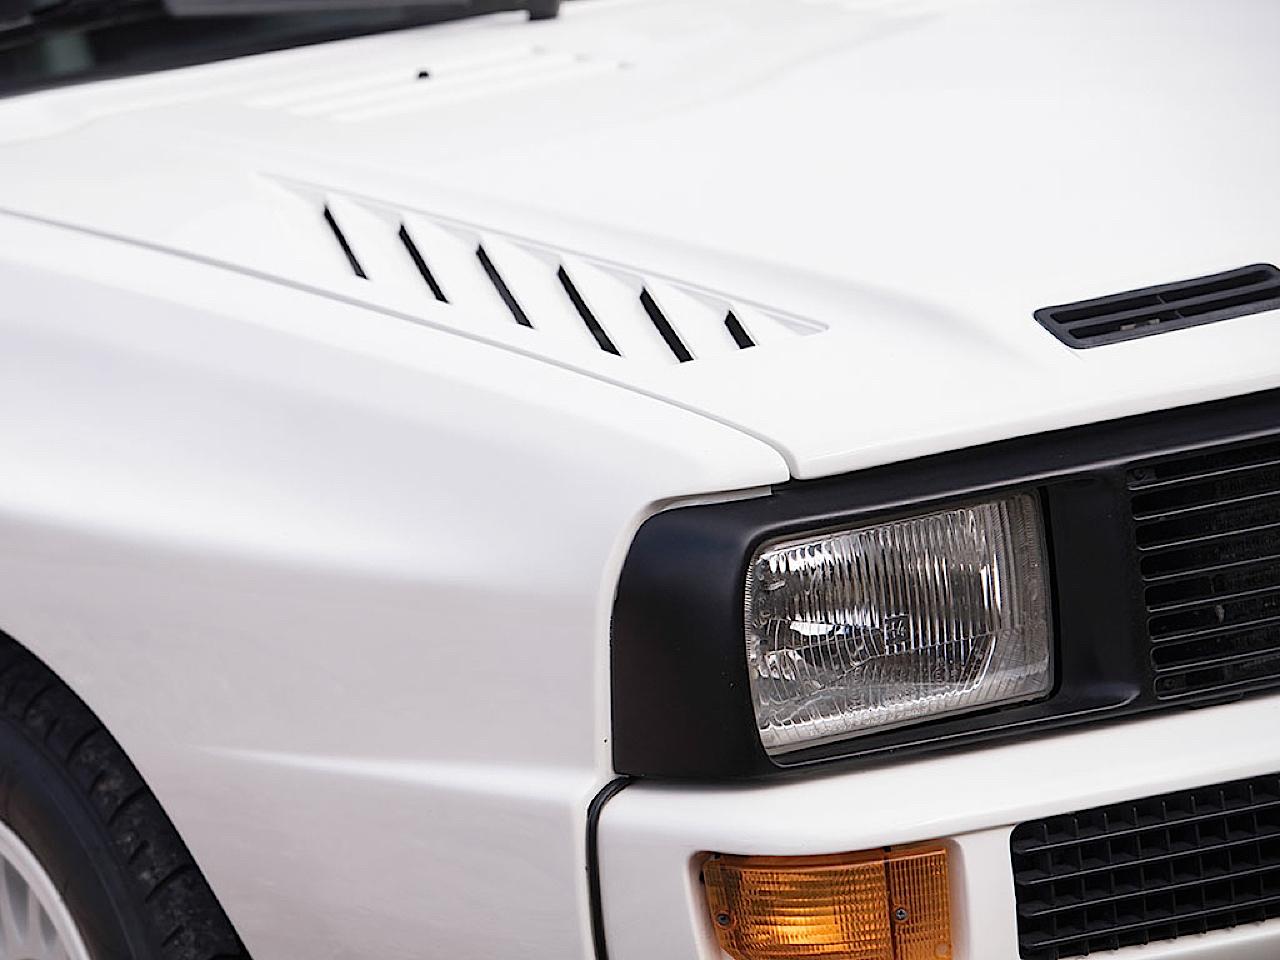 Audi Quattro Sport - Châssis court, turbo et muscu ! 15